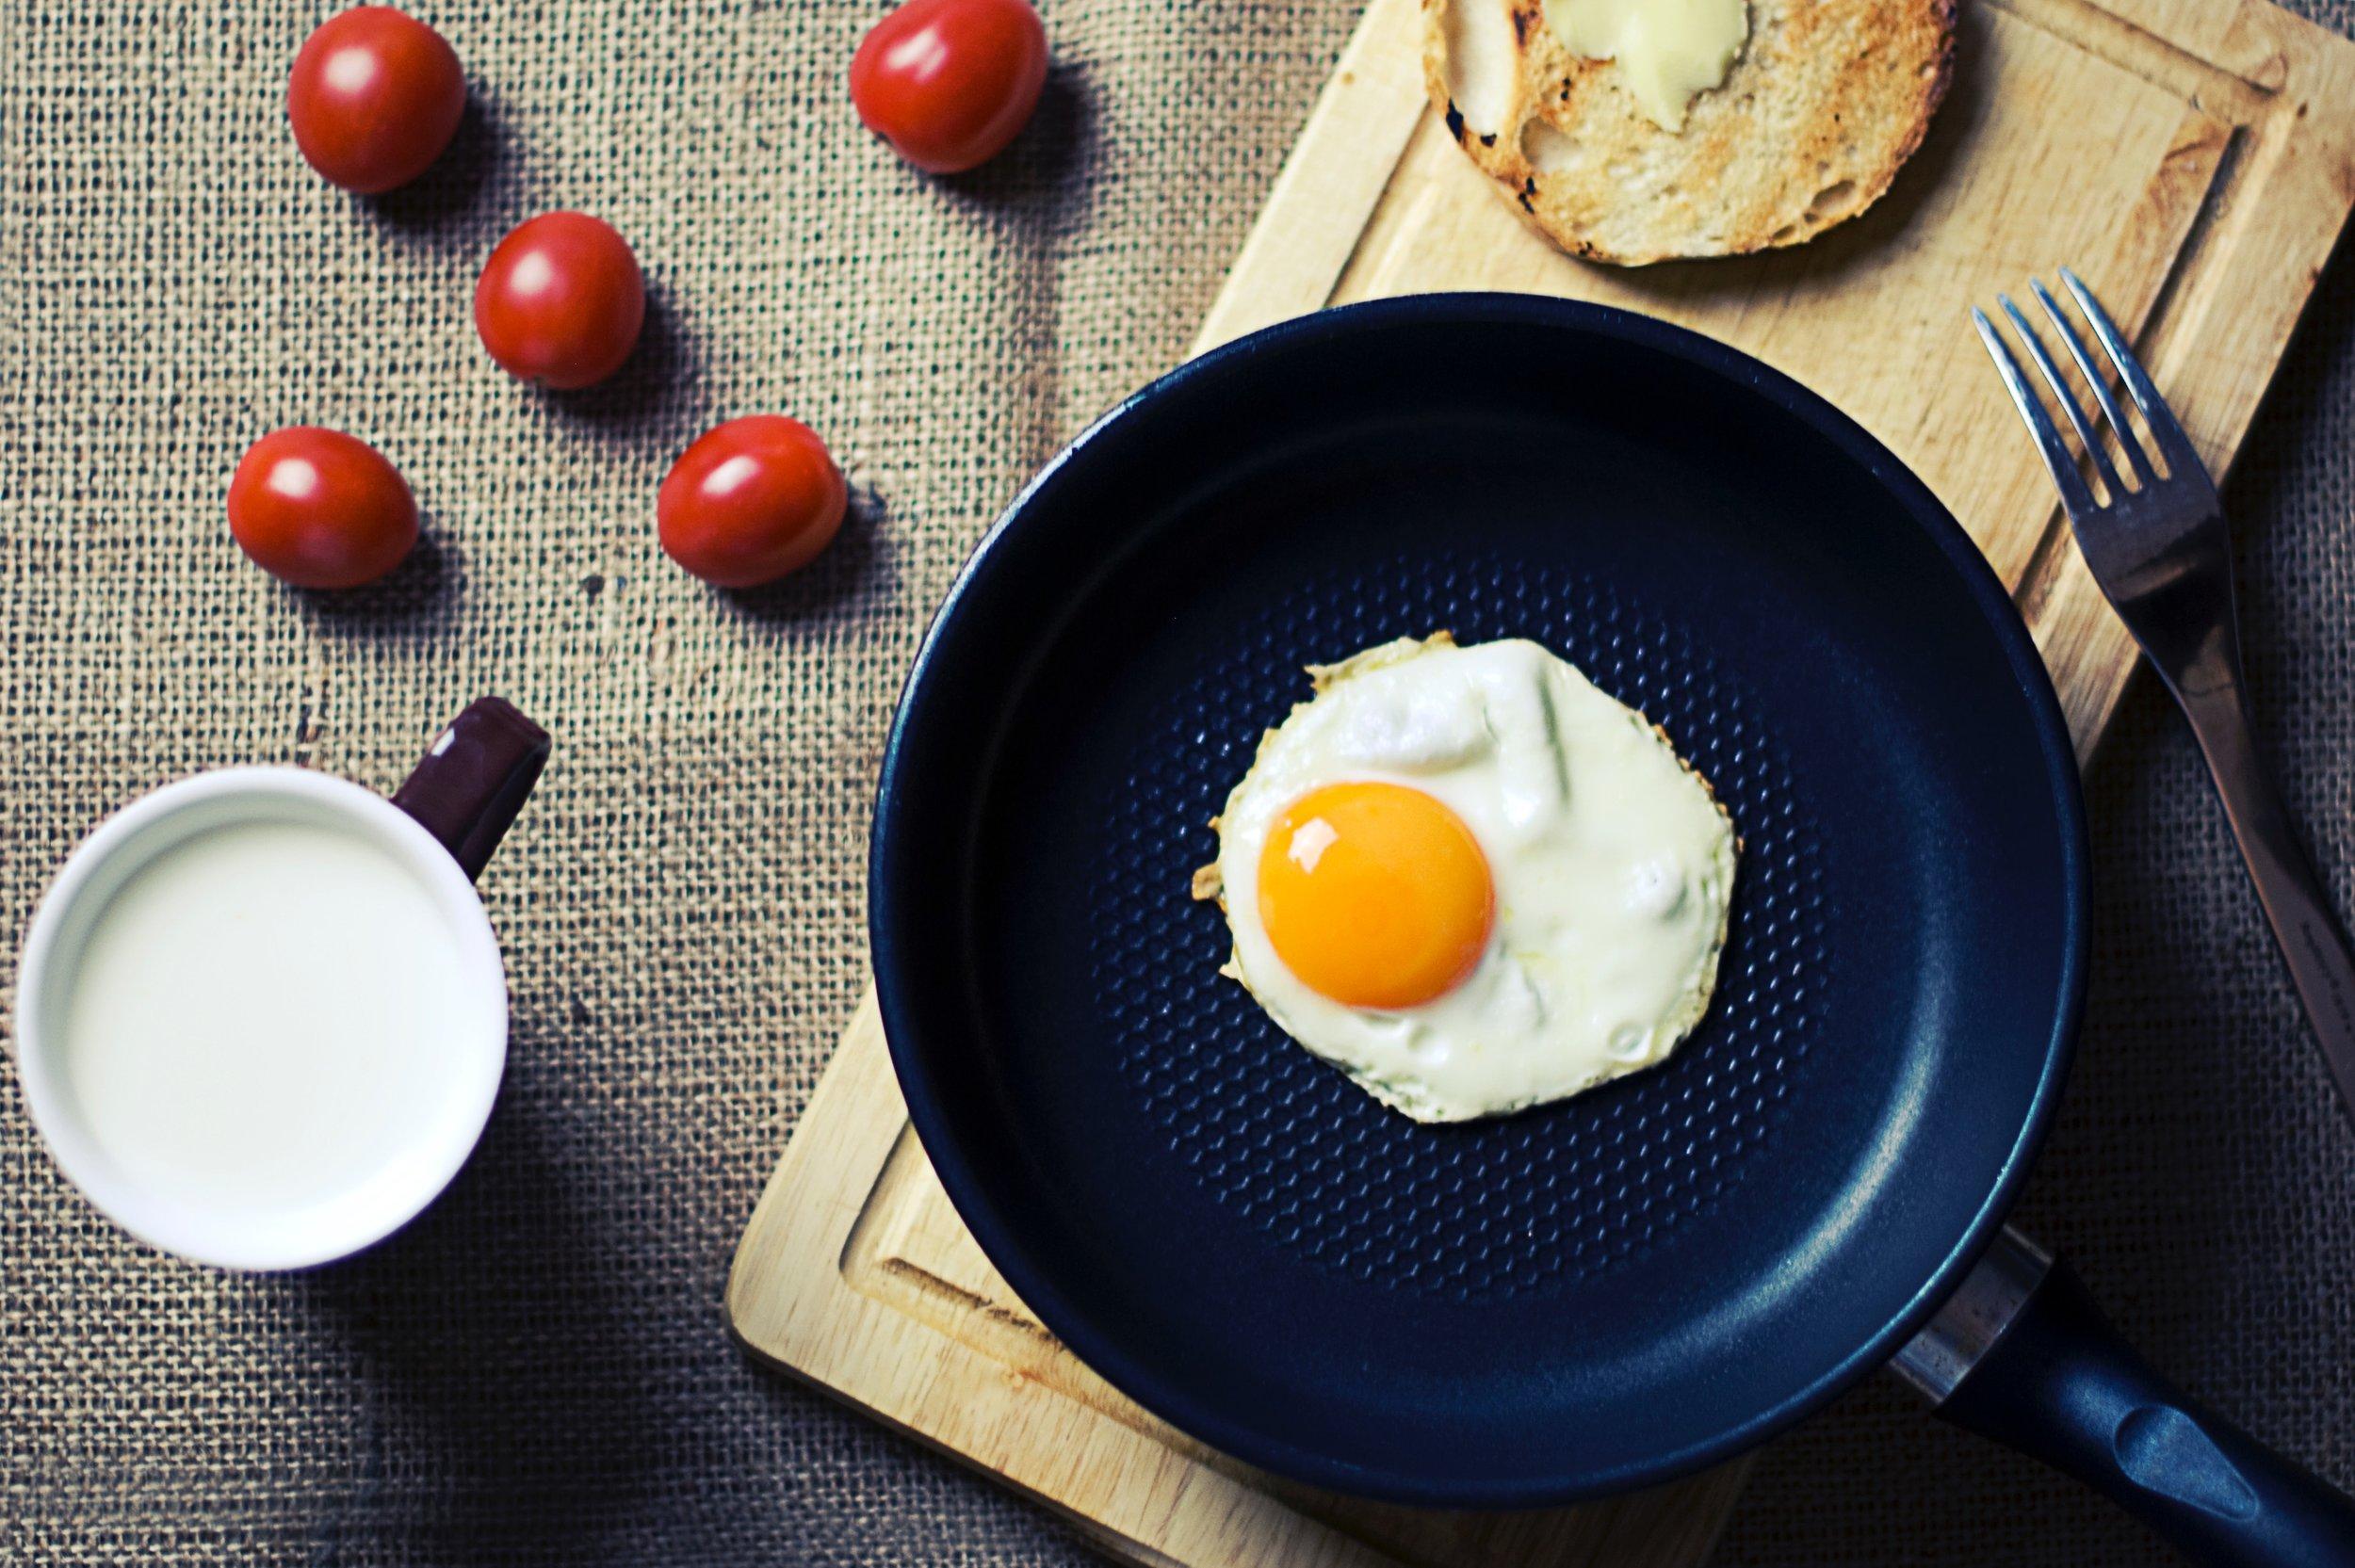 breakfast-cherry-tomatoes-cup-8806.jpg